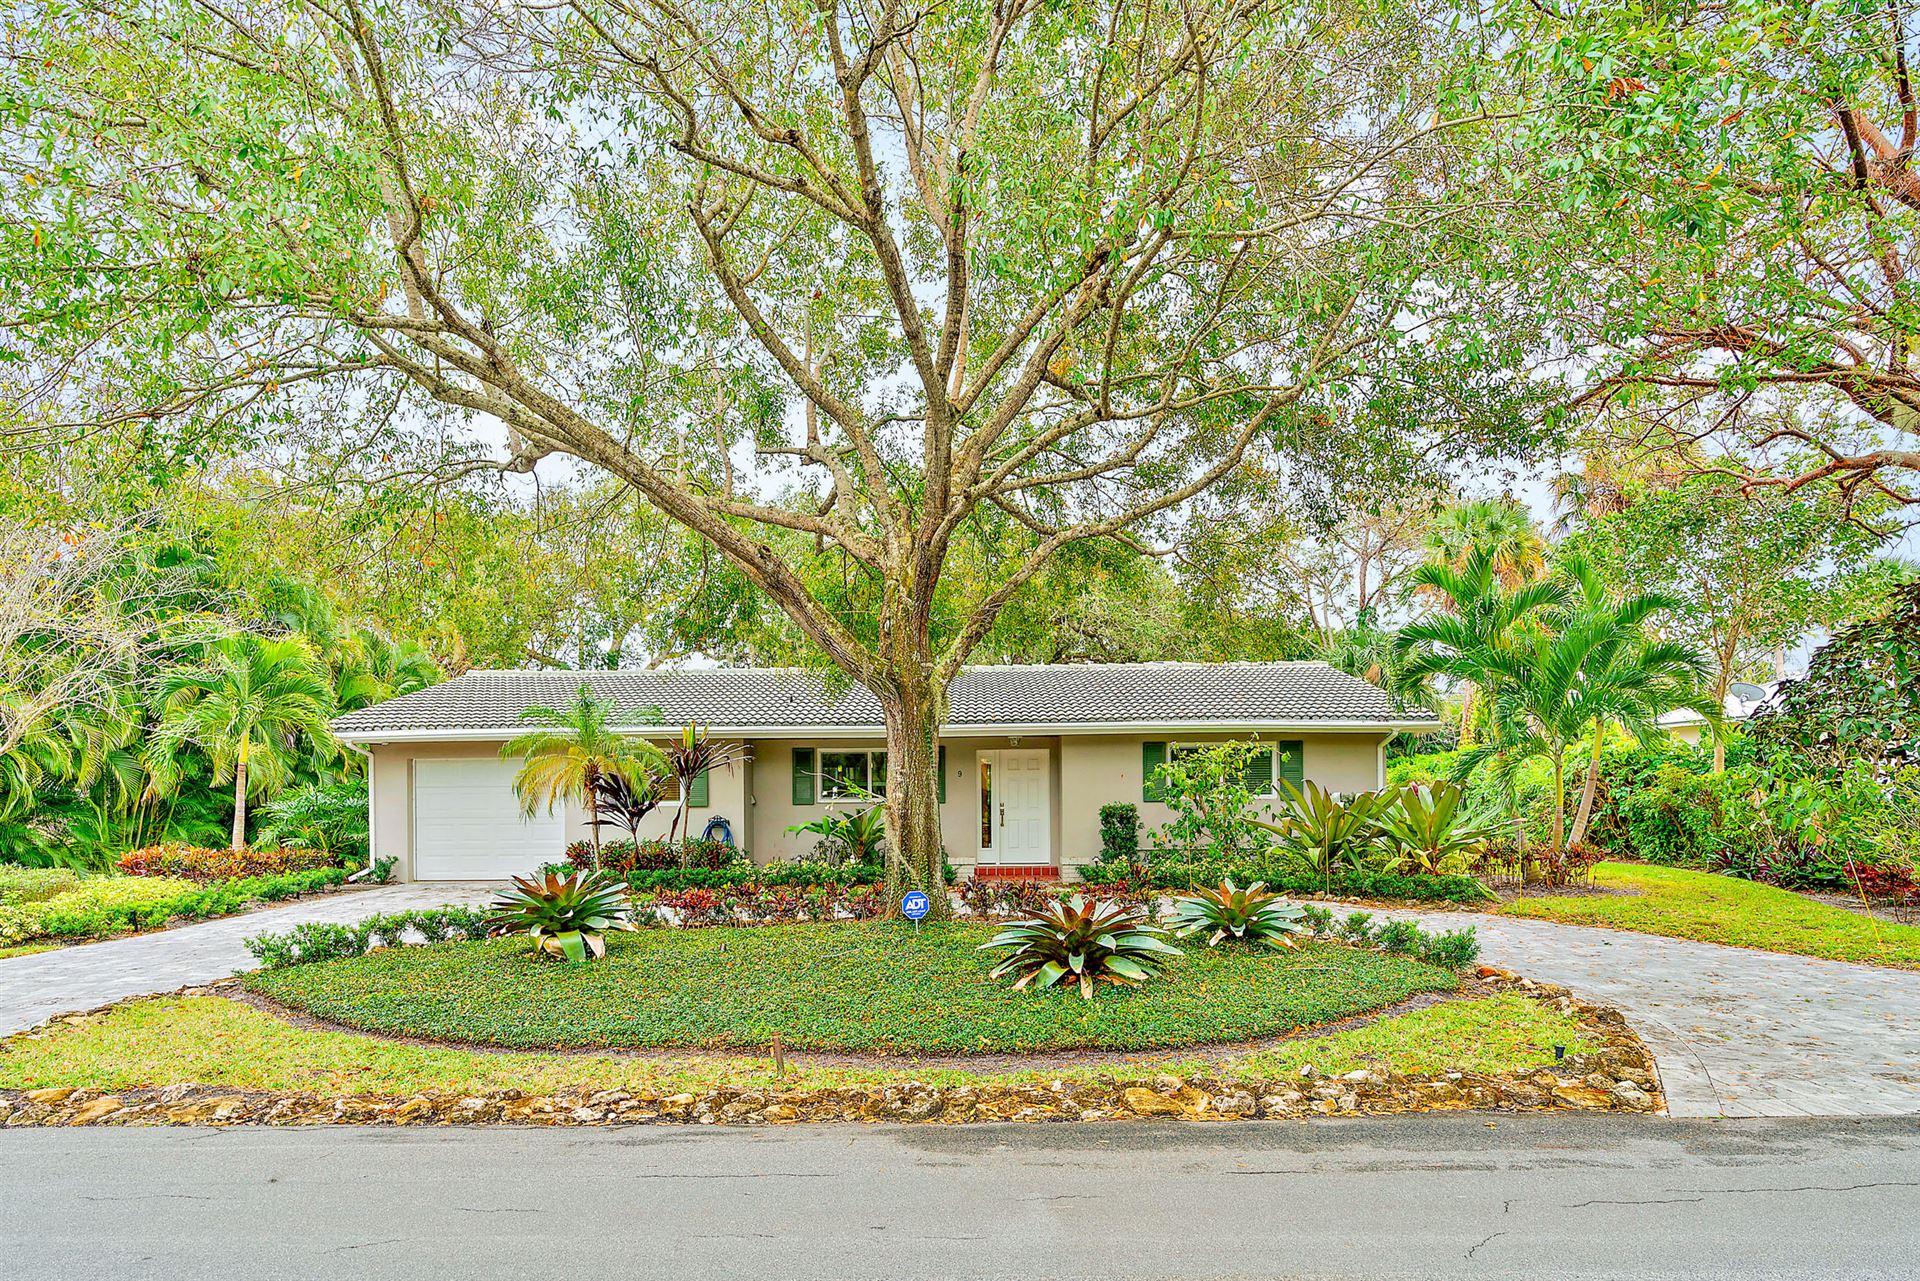 9 Emarita Way, Stuart, FL 34996 - #: RX-10681832